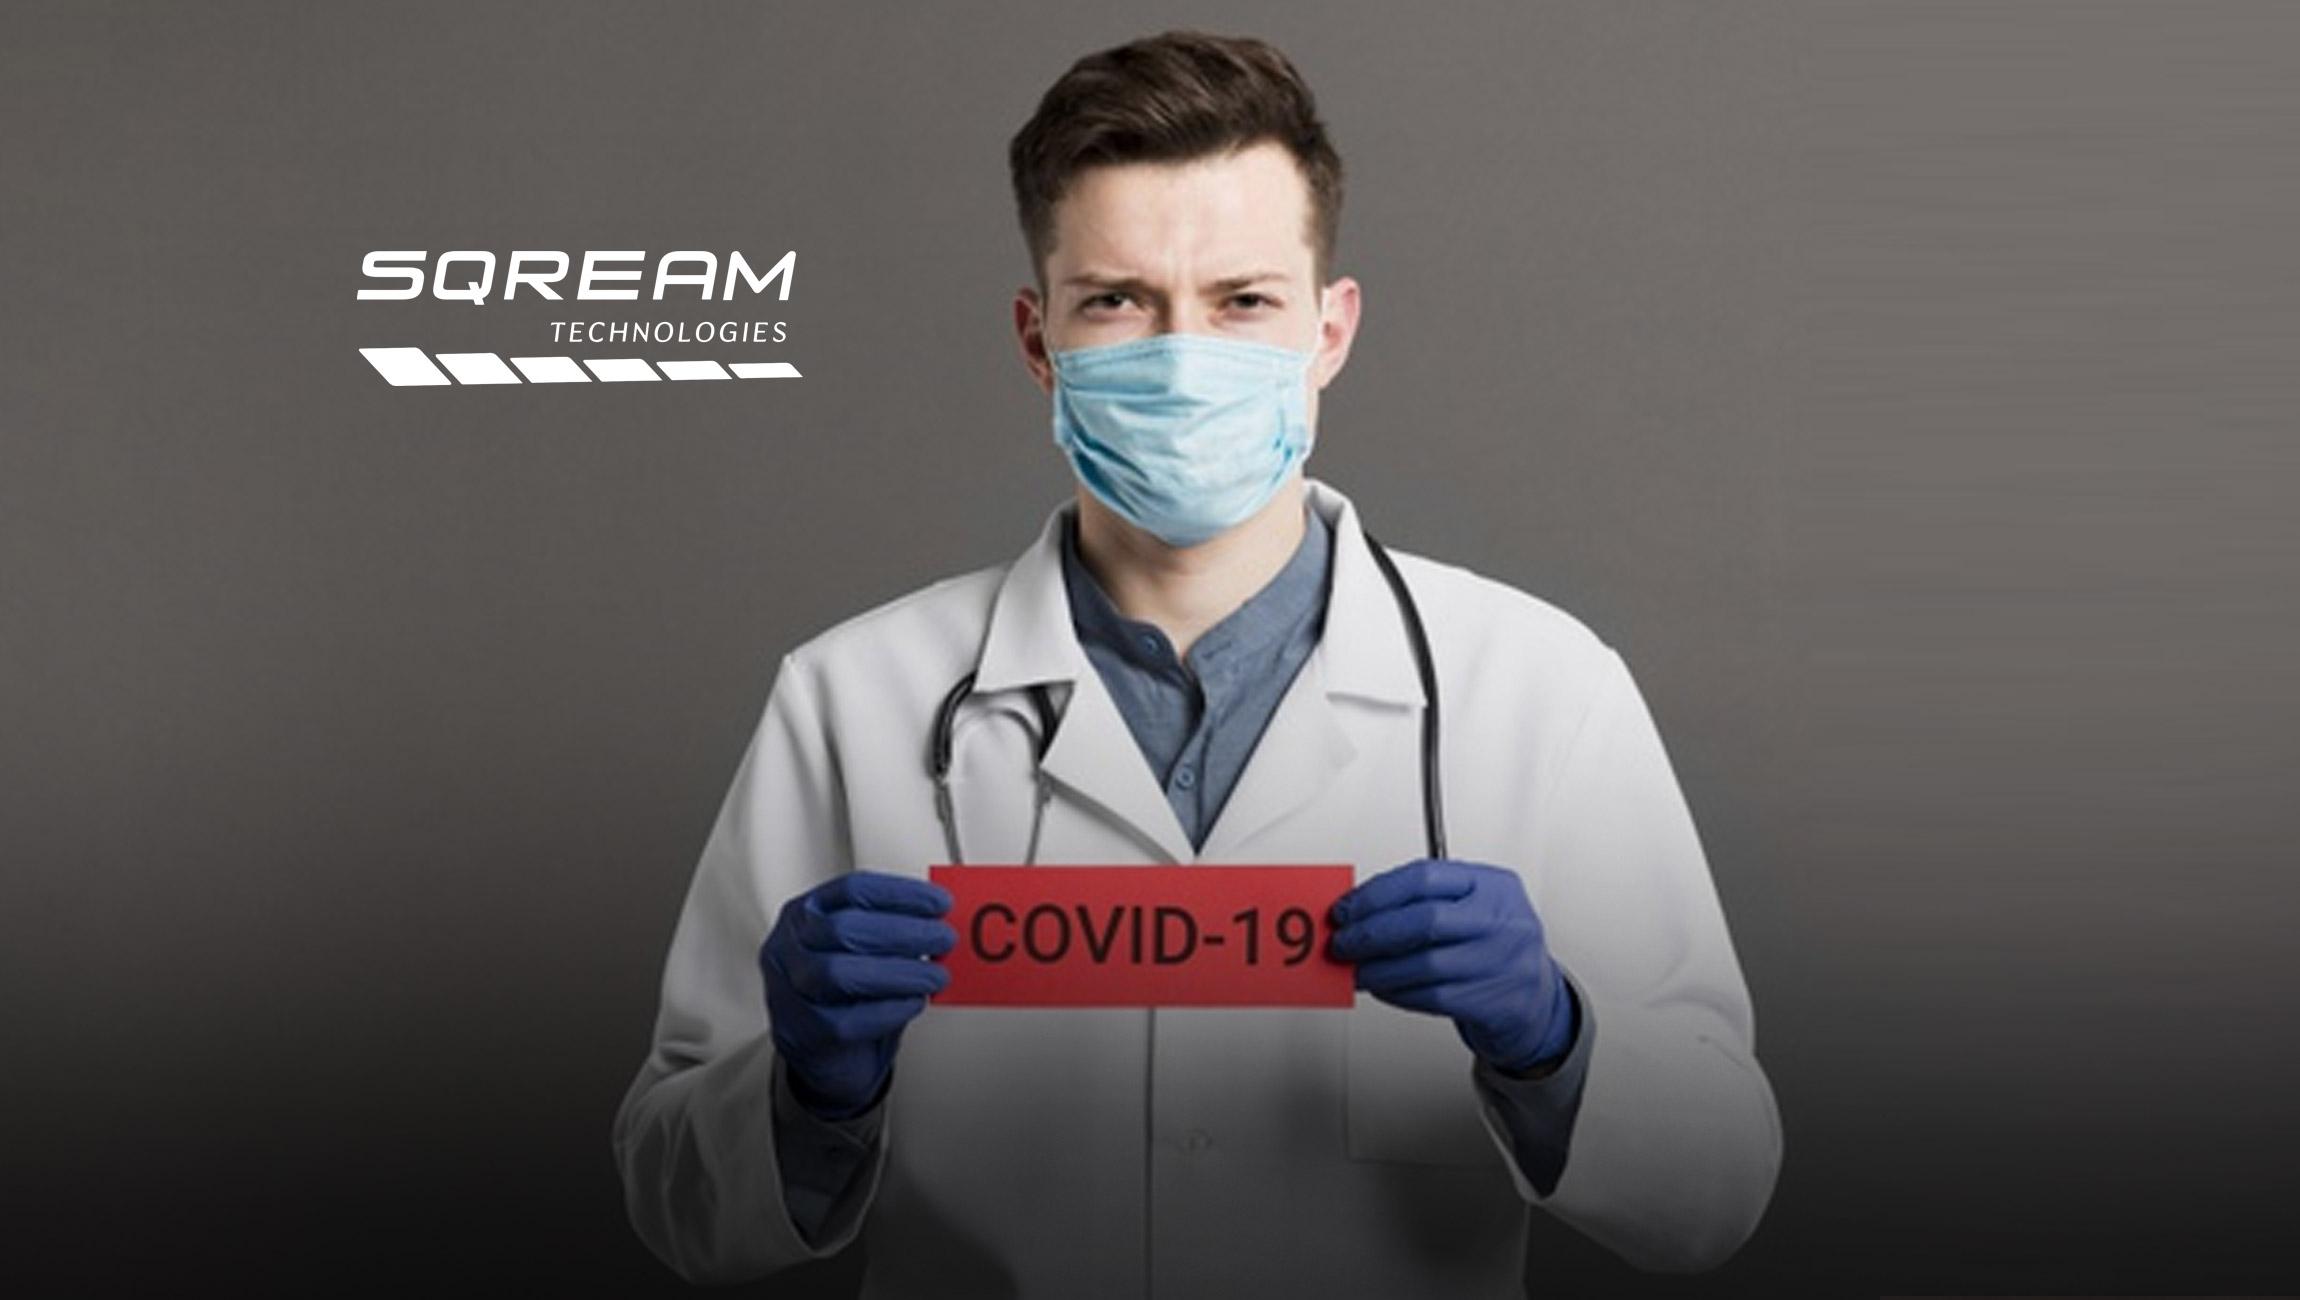 SQream Offers Free Licenses to Organizations Using Data Analytics to Fight the Coronavirus